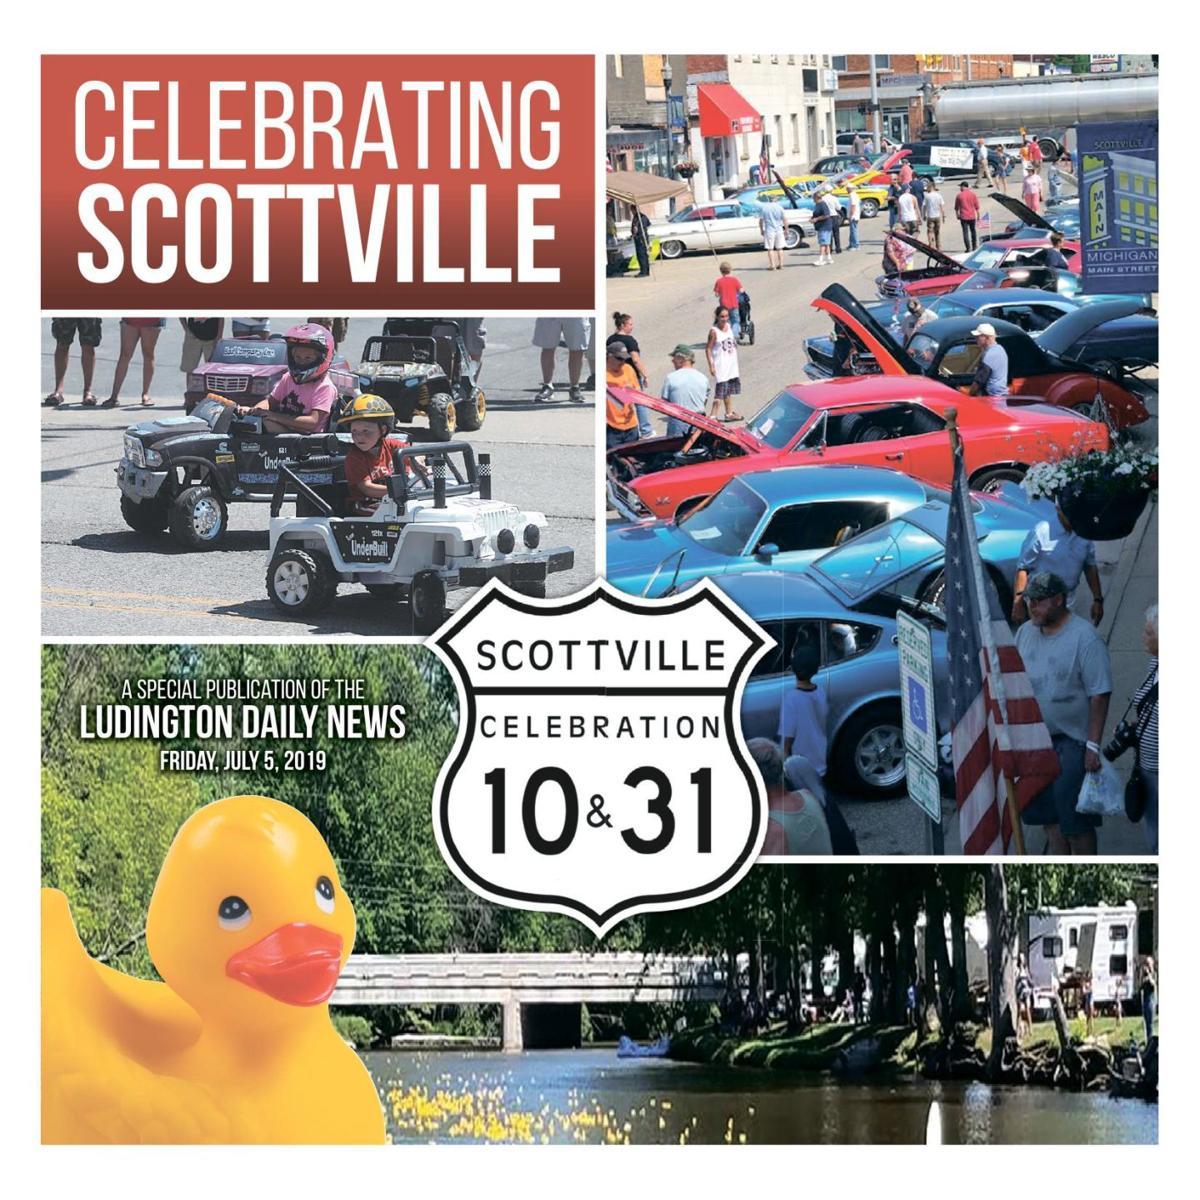 Celebrating Scottville 2019